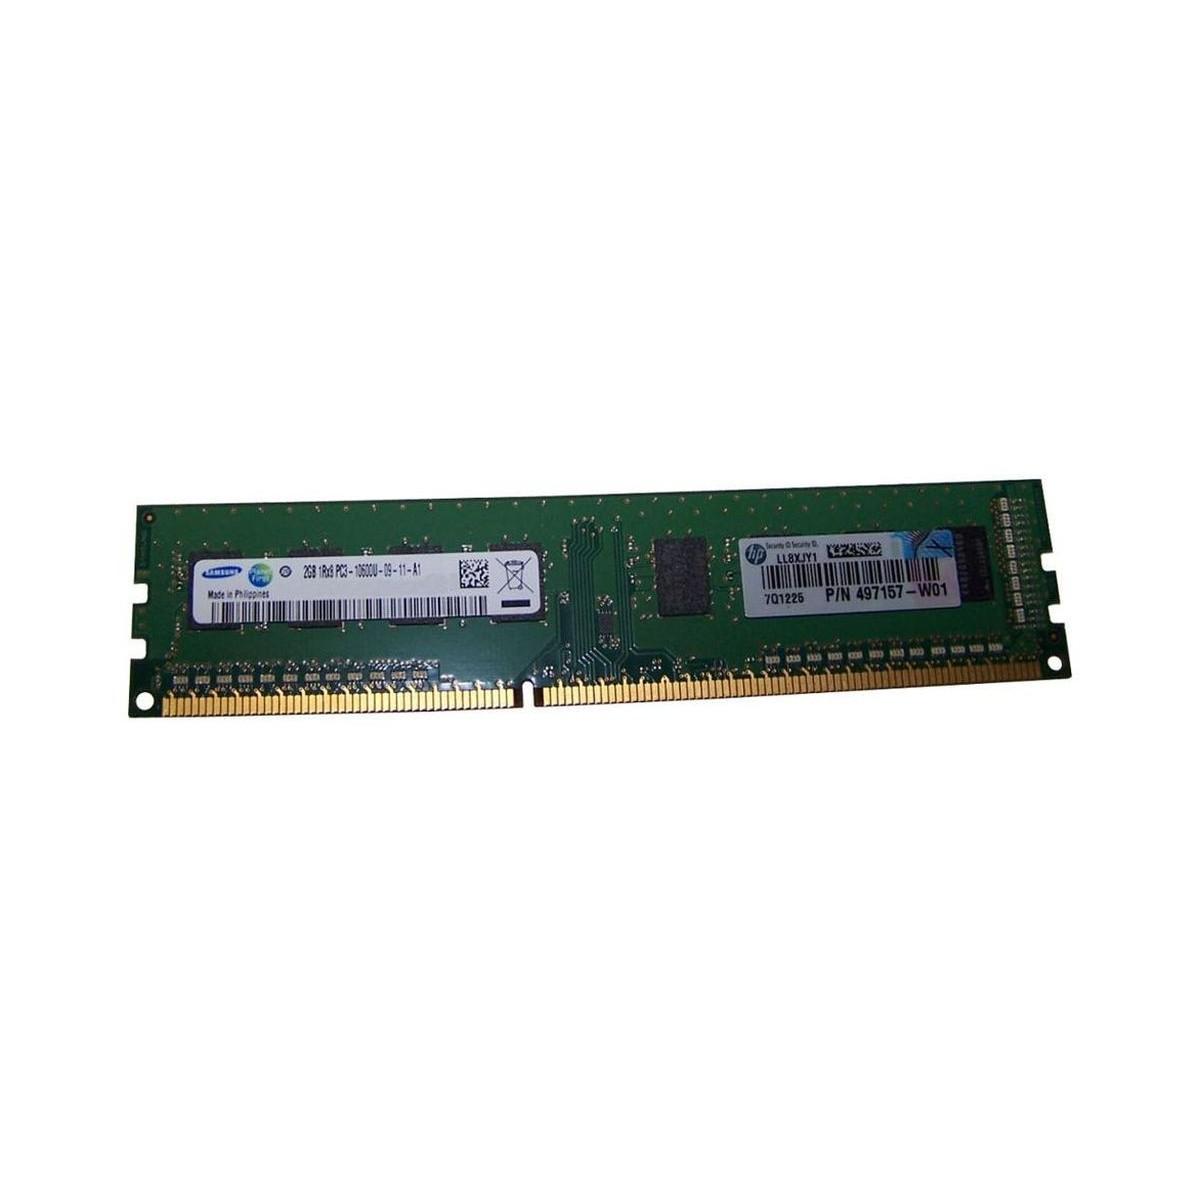 KABEL COMPAQ SCSI 68PIN 1,8M VHDCI LVD 313375-001